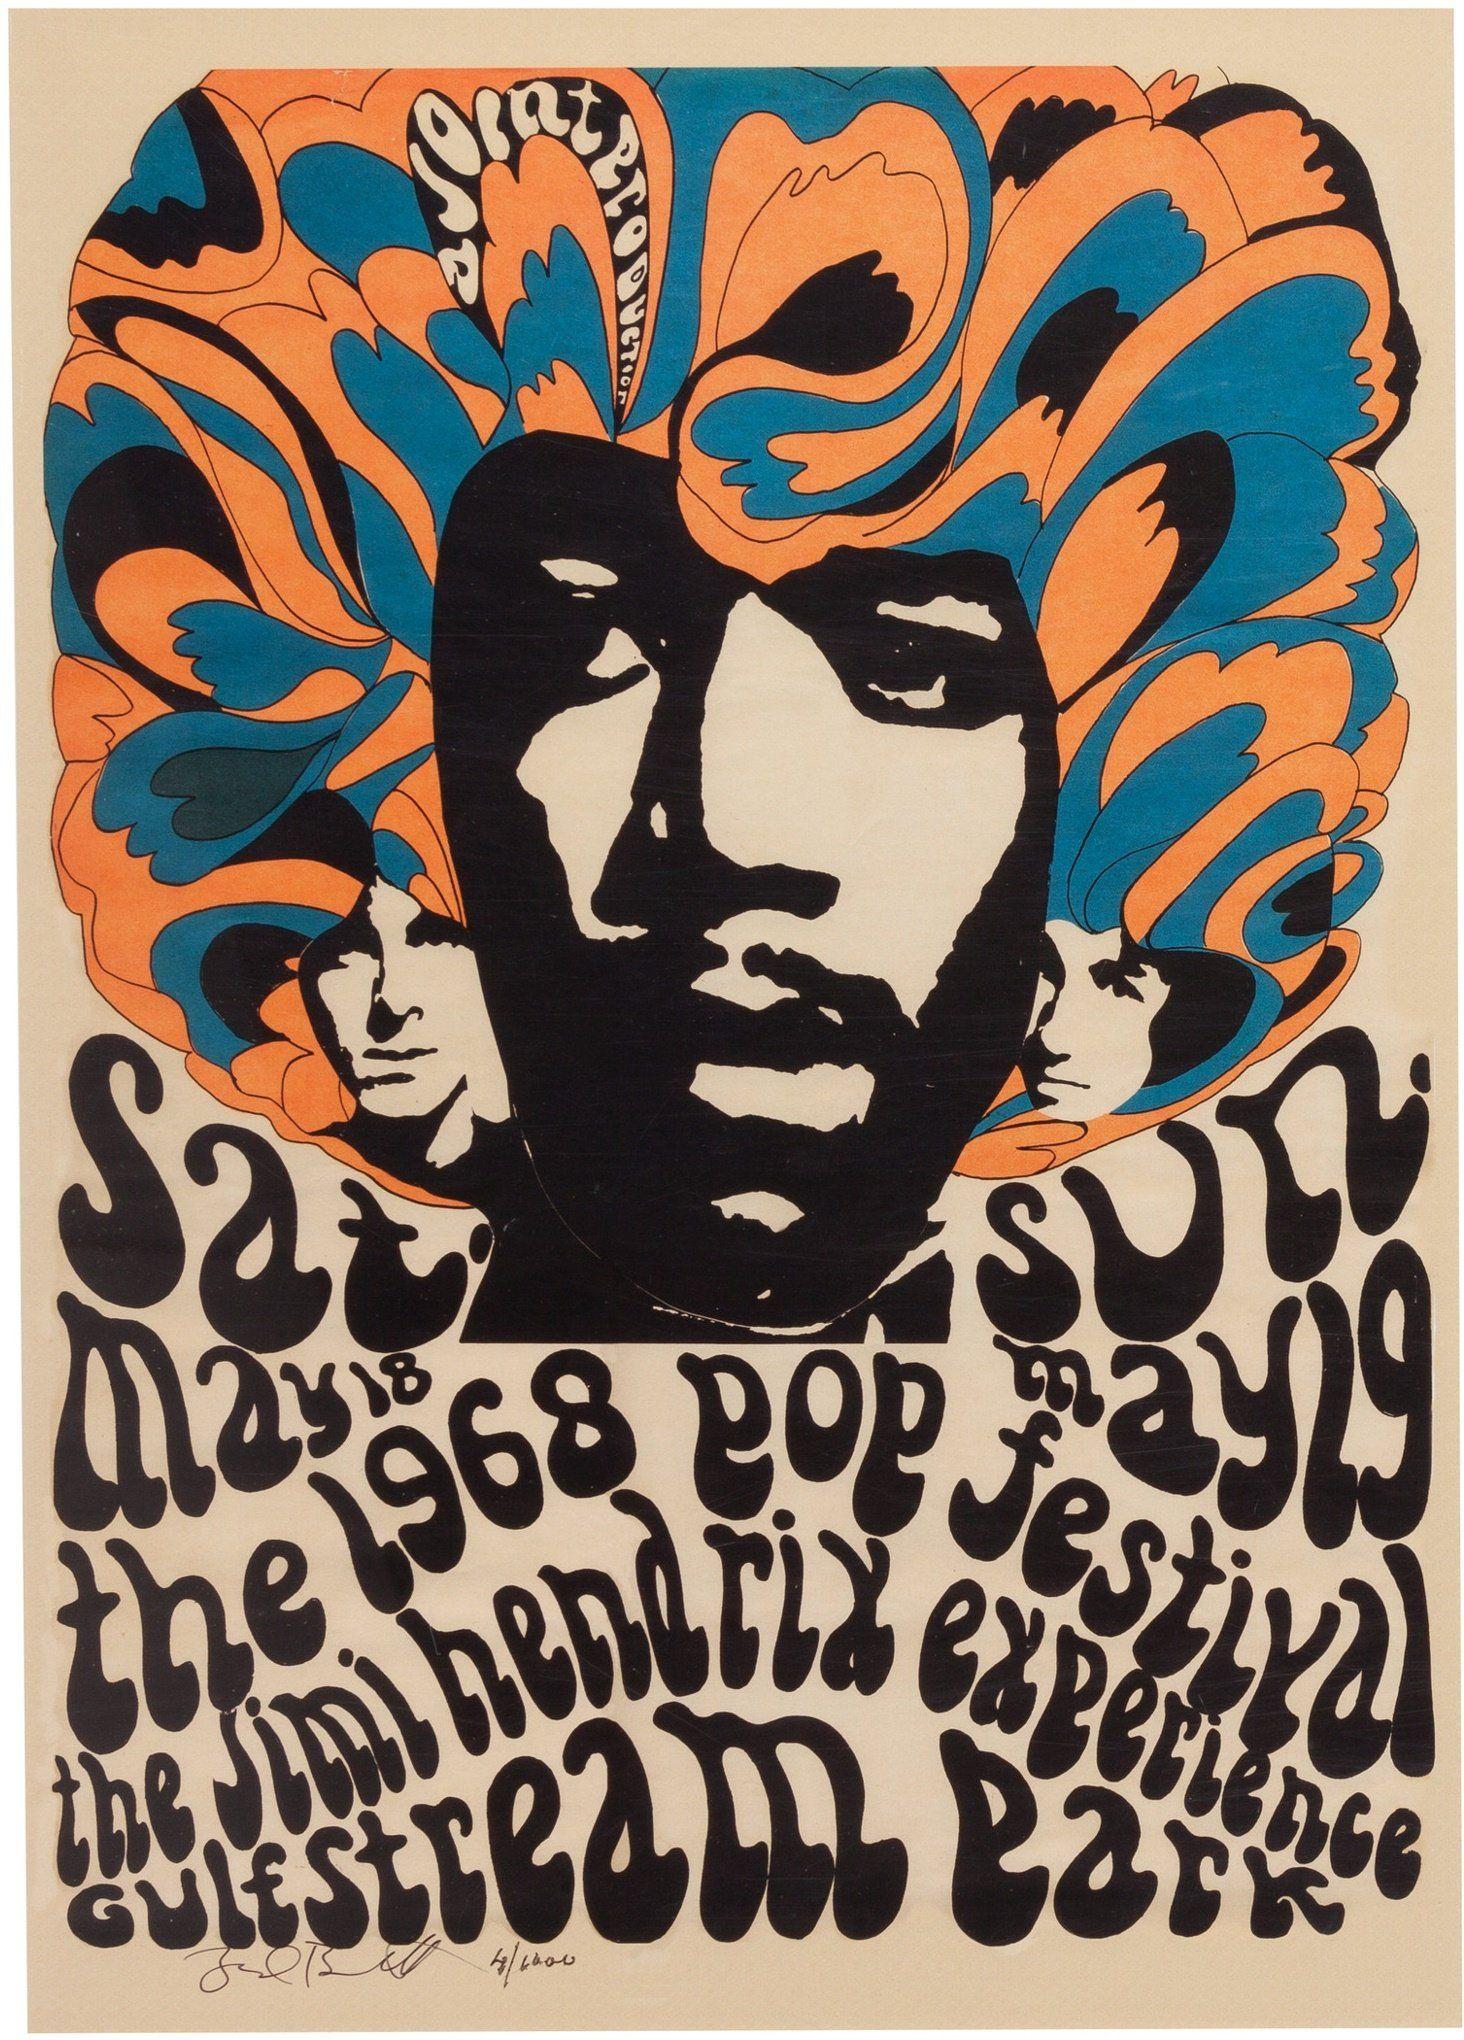 jimi hendrix  pop art retro vintage large  print poster painting Australia